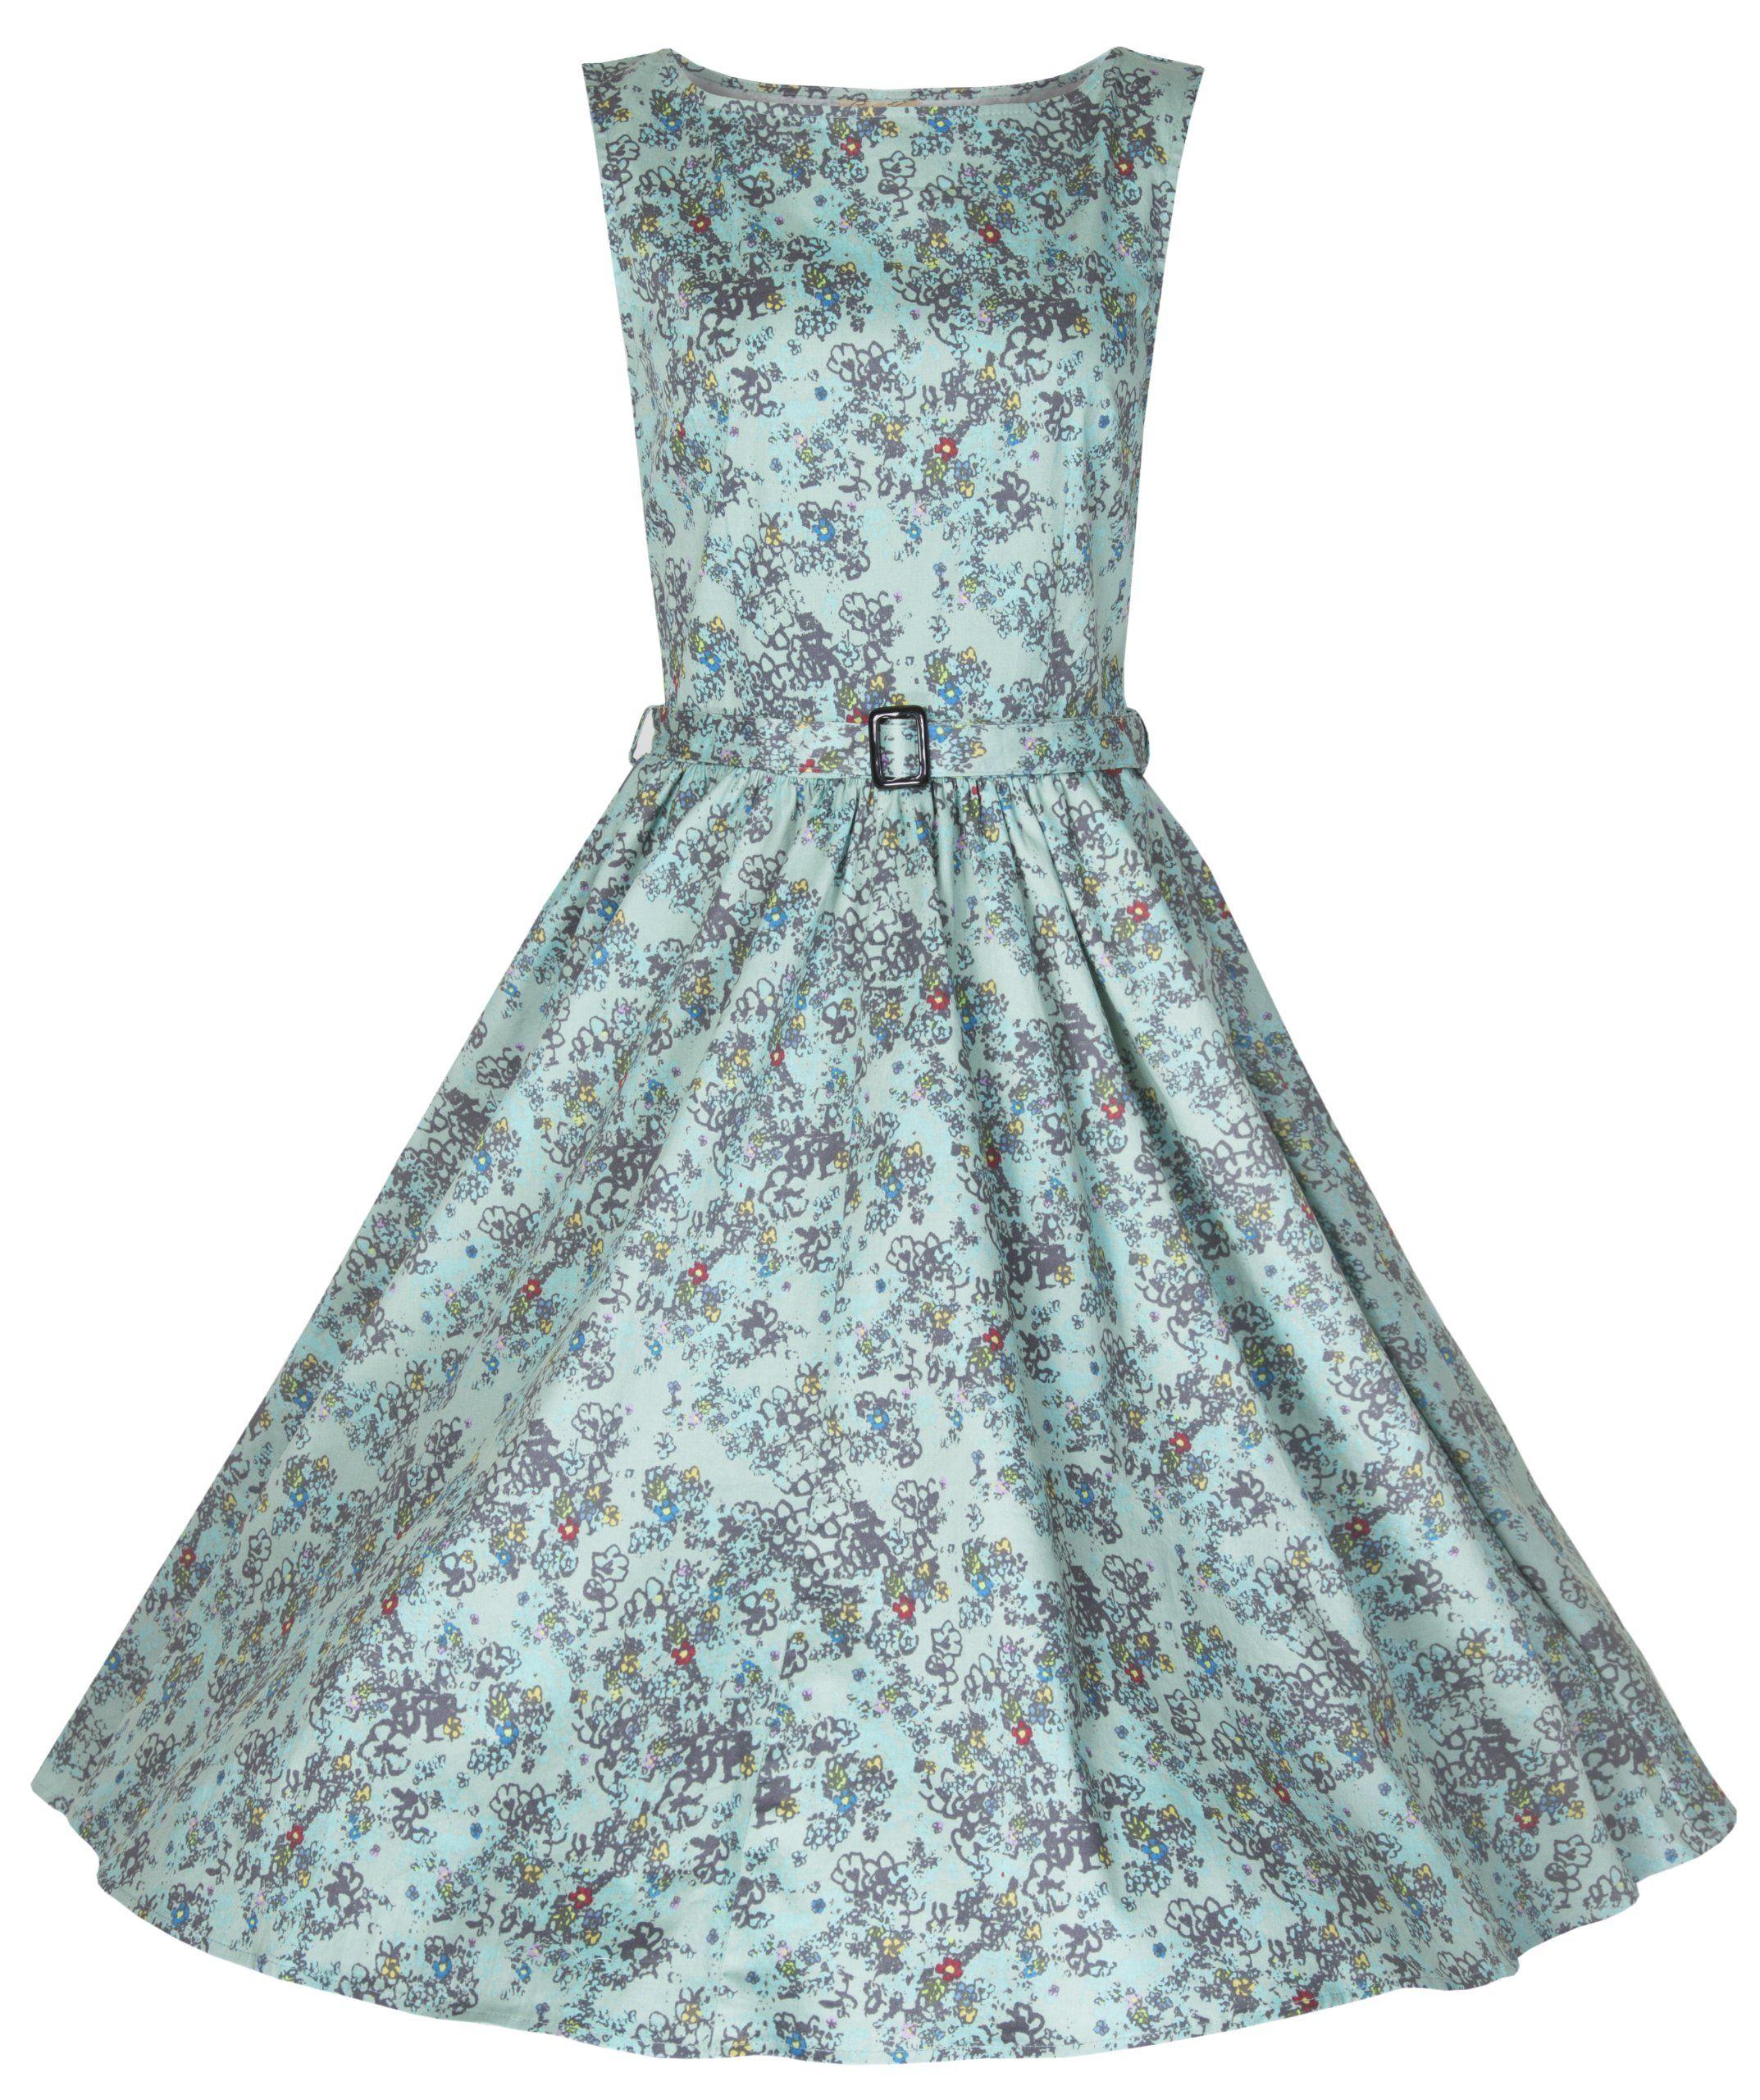 Lindy Bop Classy Floral Print \'Audrey\' Hepburn Style Vintage 1950\'s ...